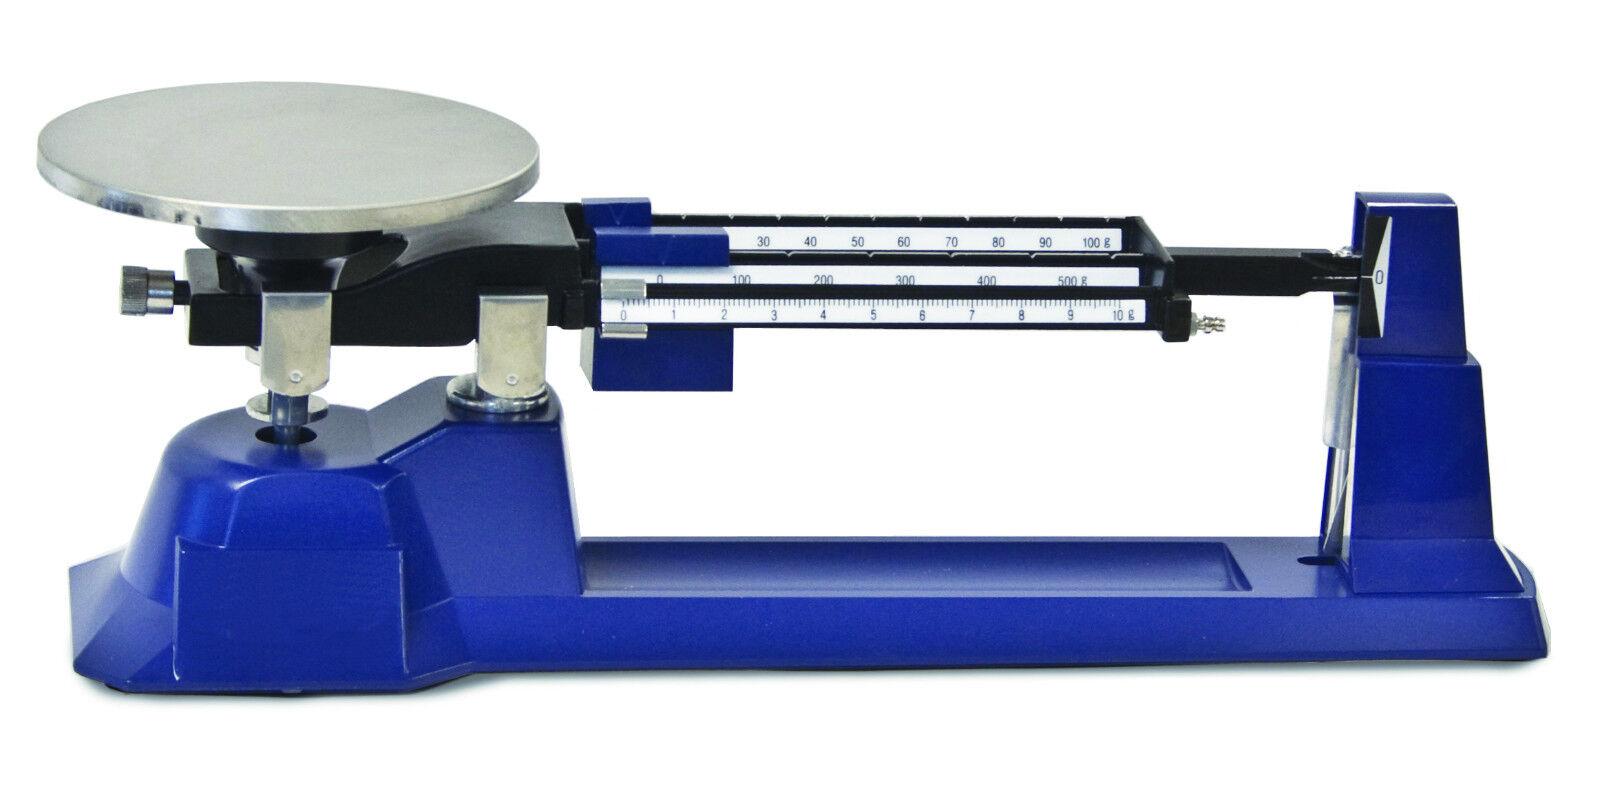 Walter Products B 300 W O Triple Beam Balance With Tare